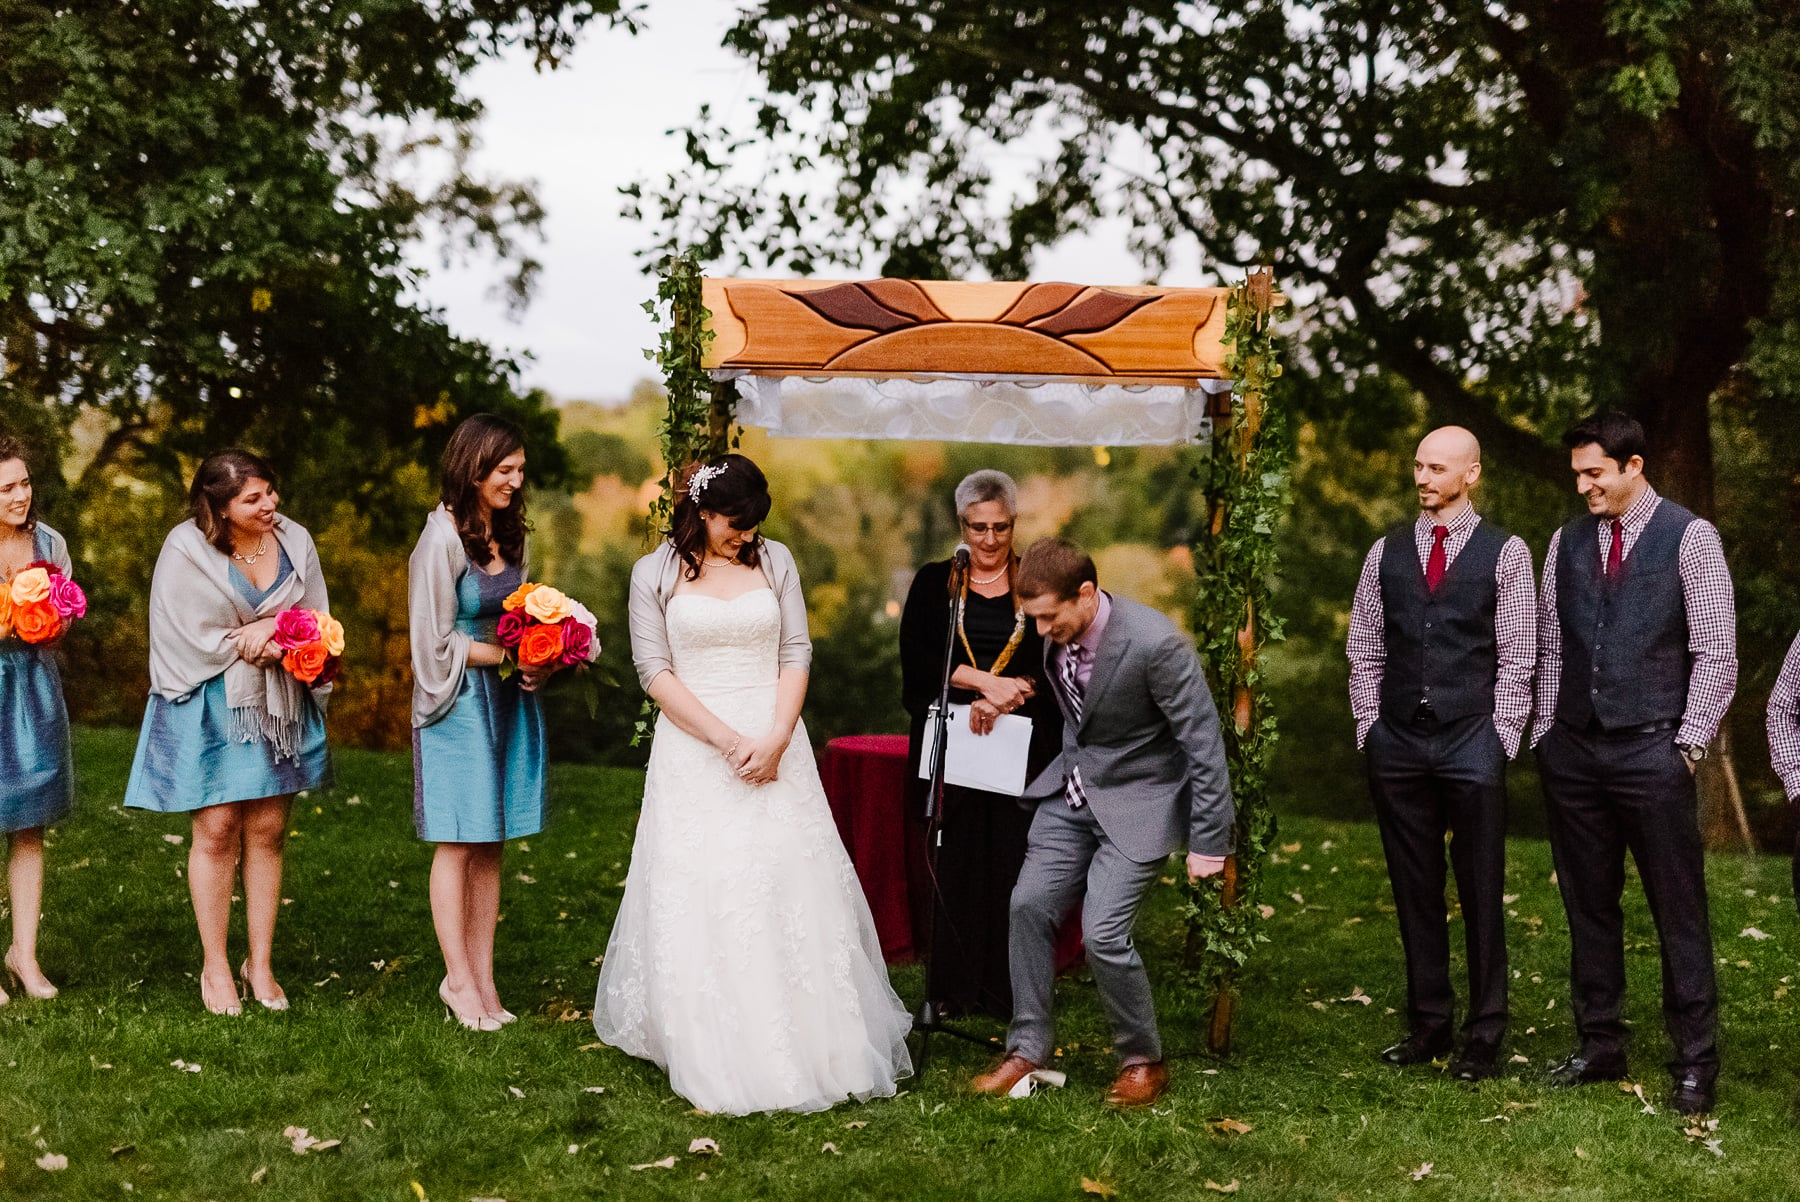 47-Morris Arboretum Wedding Philadelphia Wedding Photographer Longbrook Photography.jpg